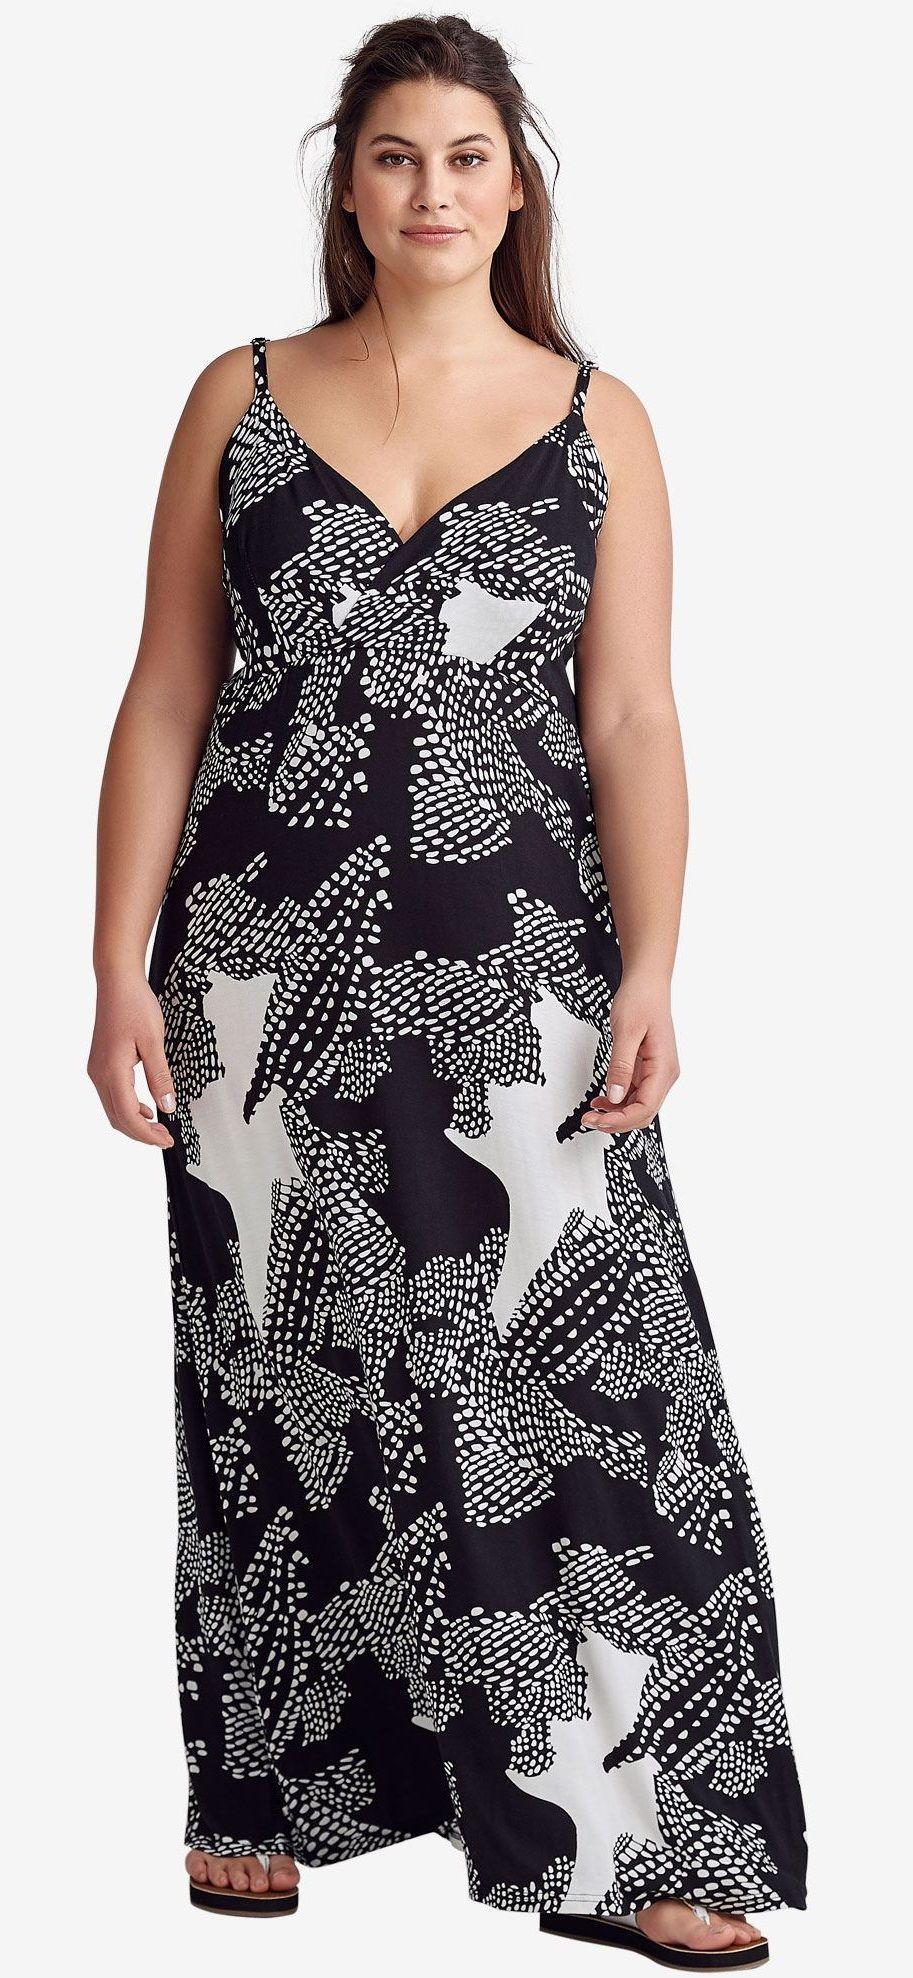 Plus Size Surplice Maxi Dress Plussize Maxi Dress Plus Size Outfits Plus Size Maxi Dresses [ 1978 x 913 Pixel ]